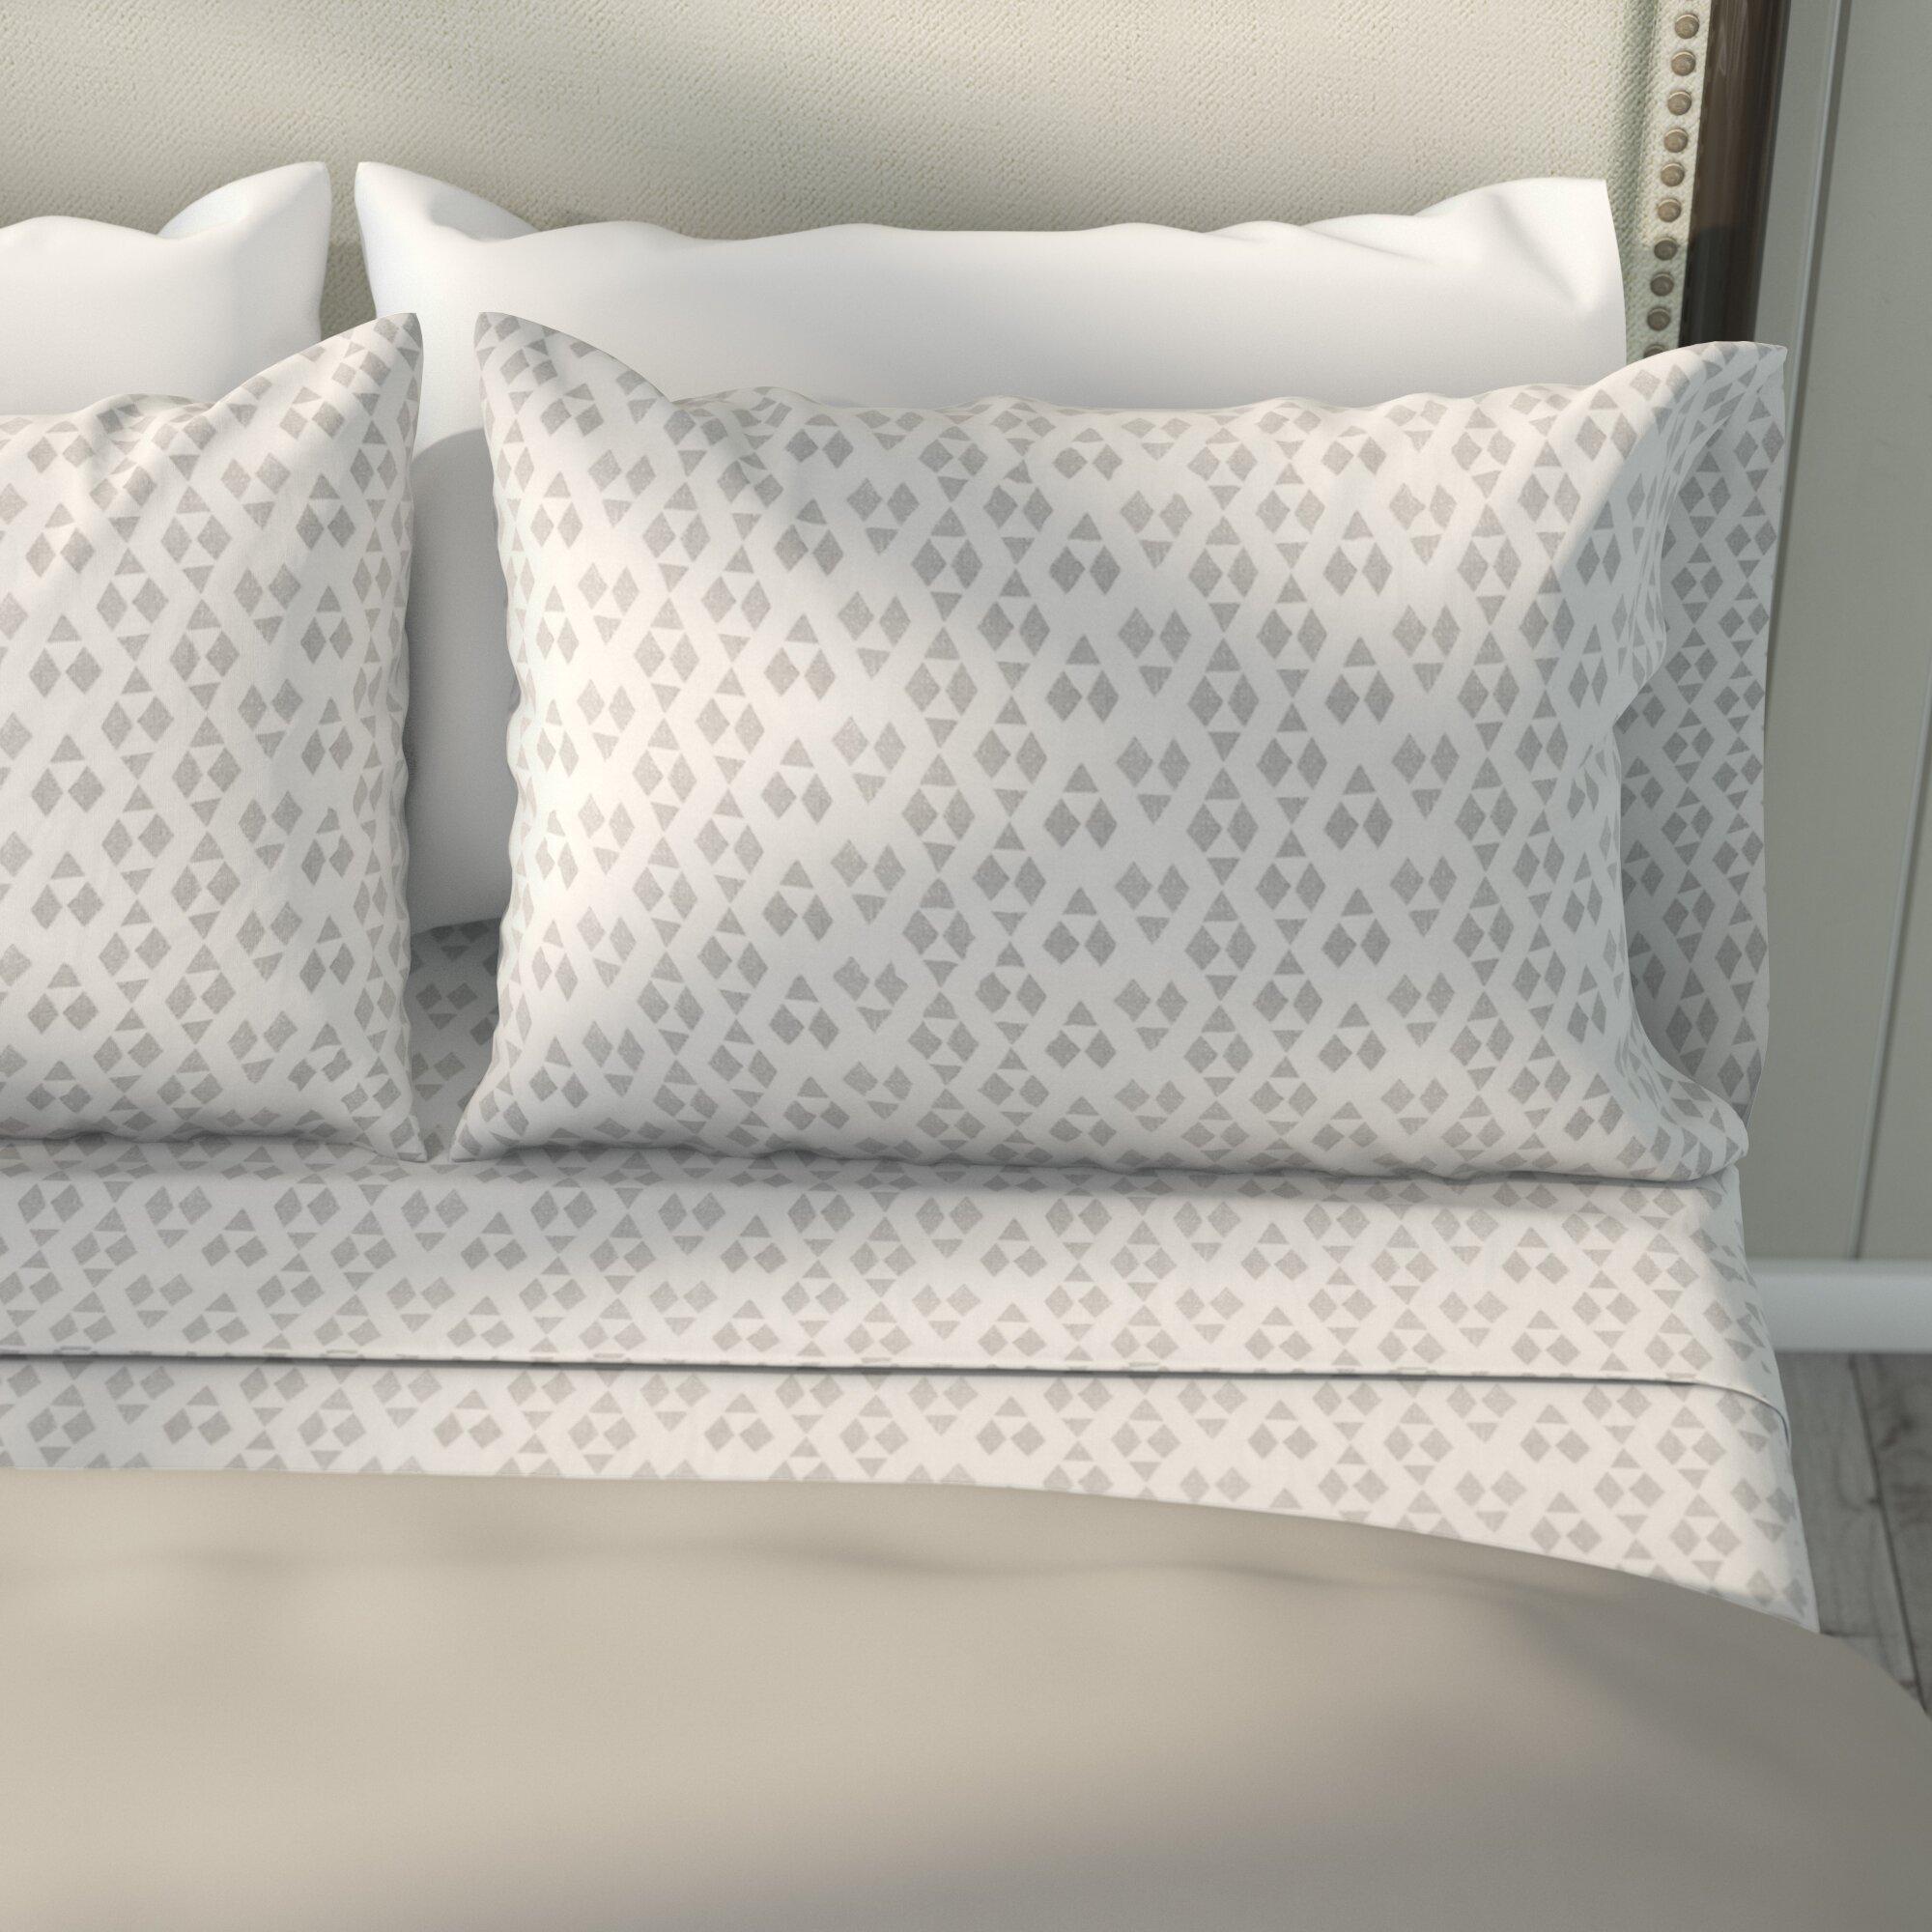 modern sheet set - laurel foundry modern farmhouse mosley cotton sheet set